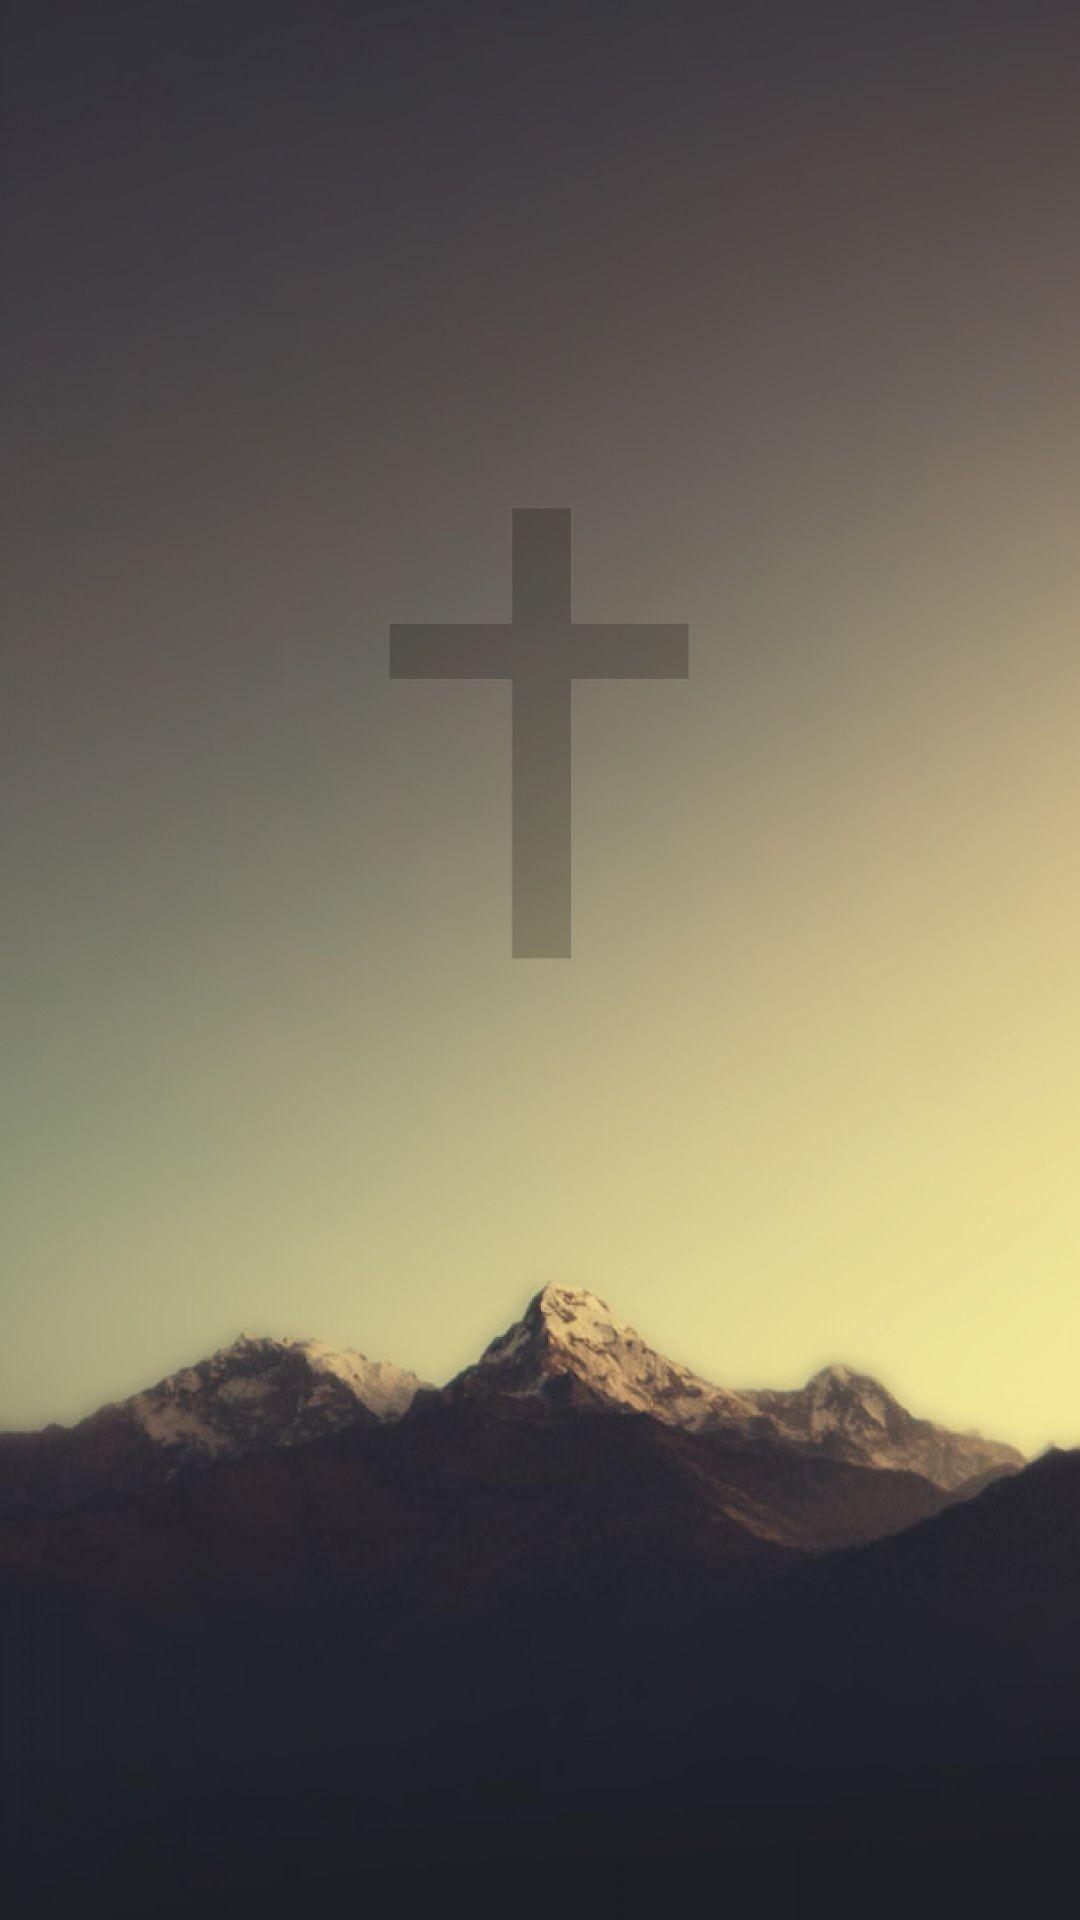 Res: 1080x1920, christian wallpaper | iPhone Wallpaper